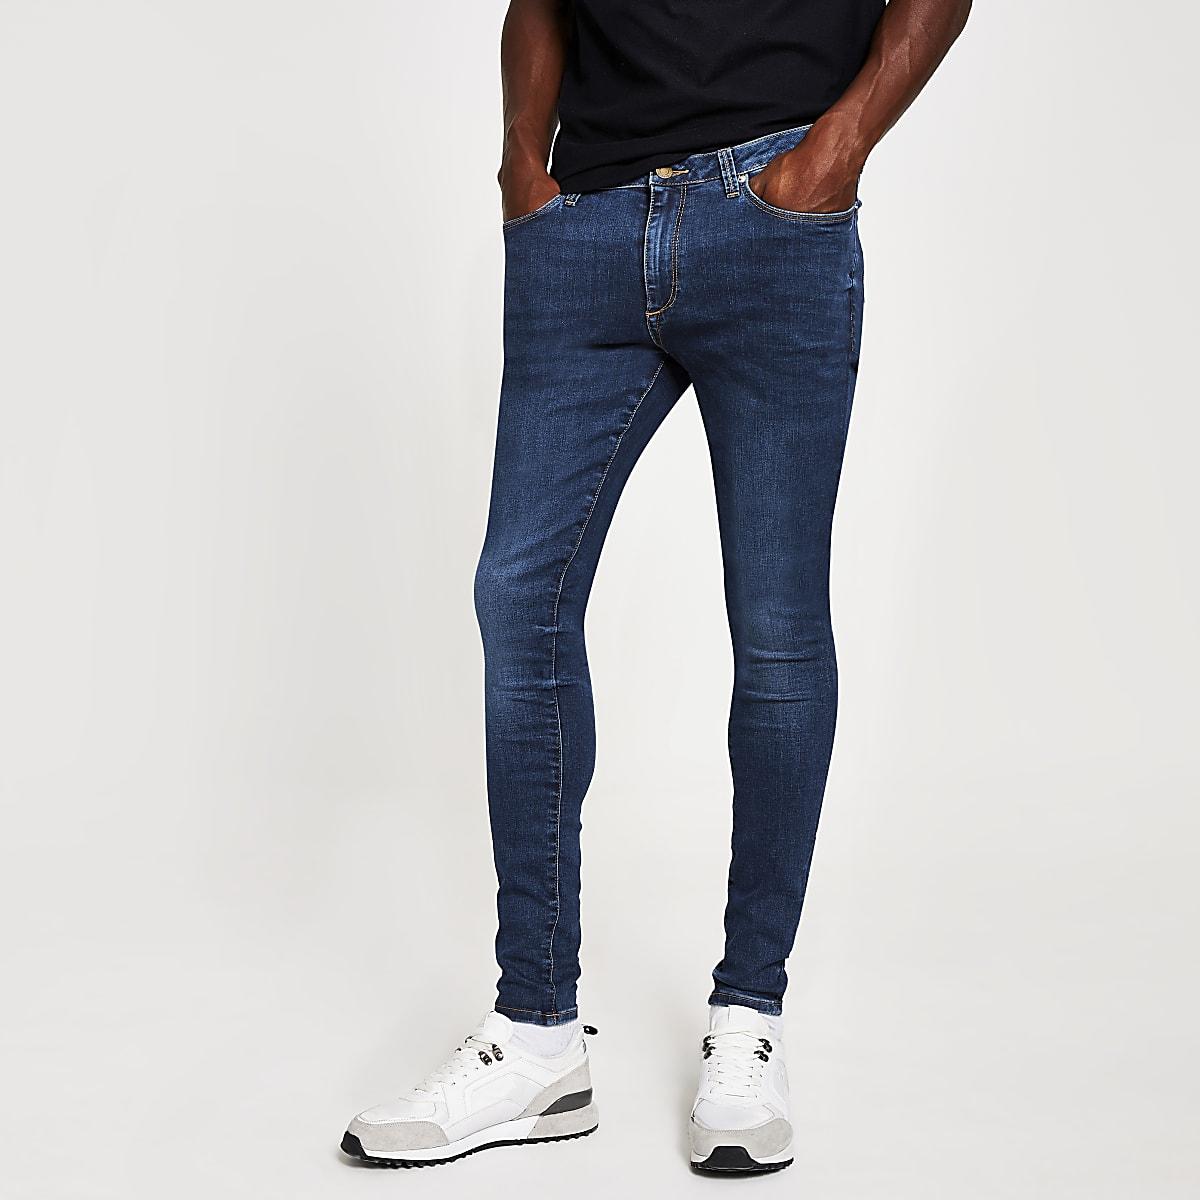 Ollie – Jean ultra-skinnybleu foncé